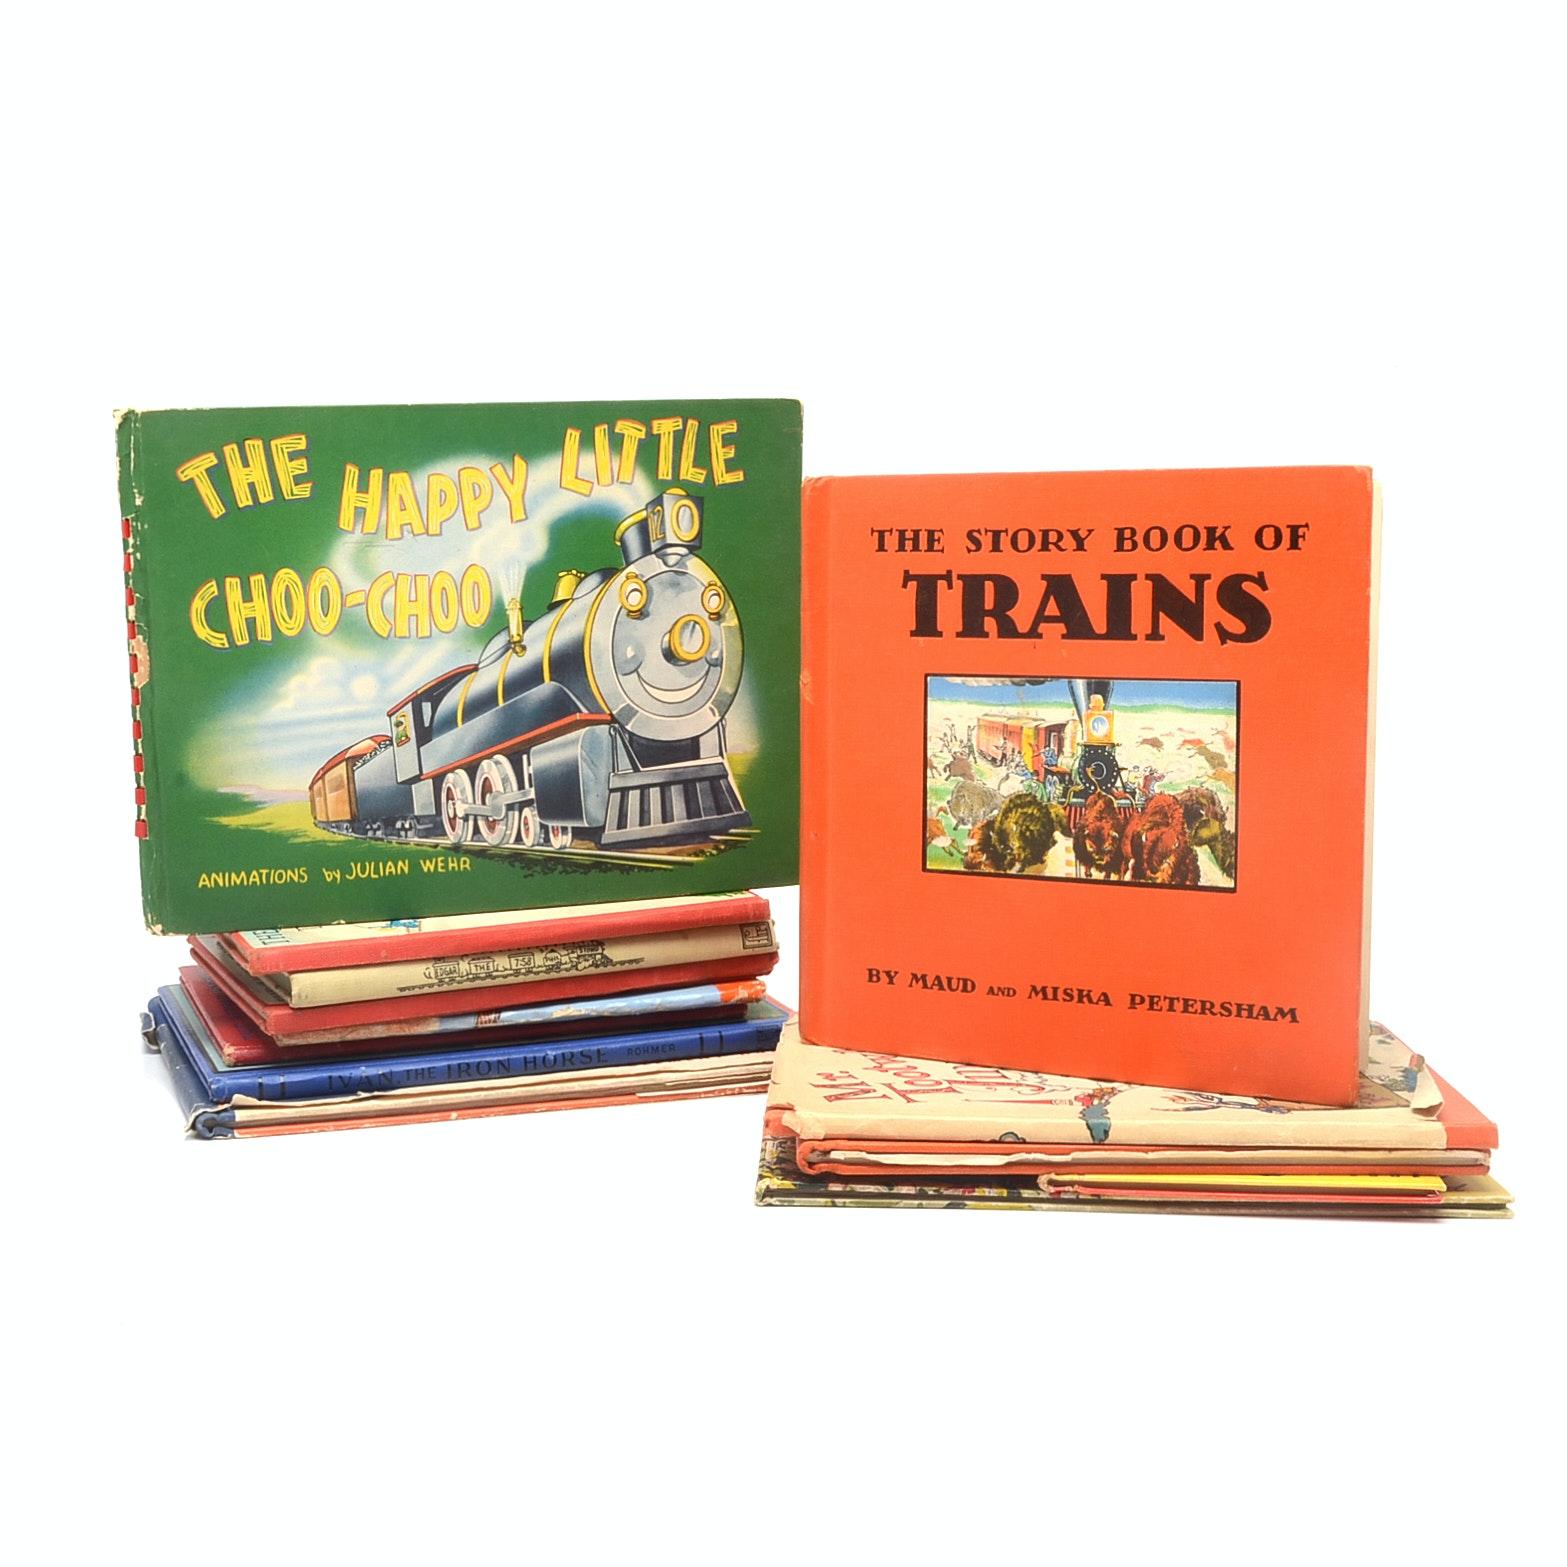 Vintage Children's Books on Trains